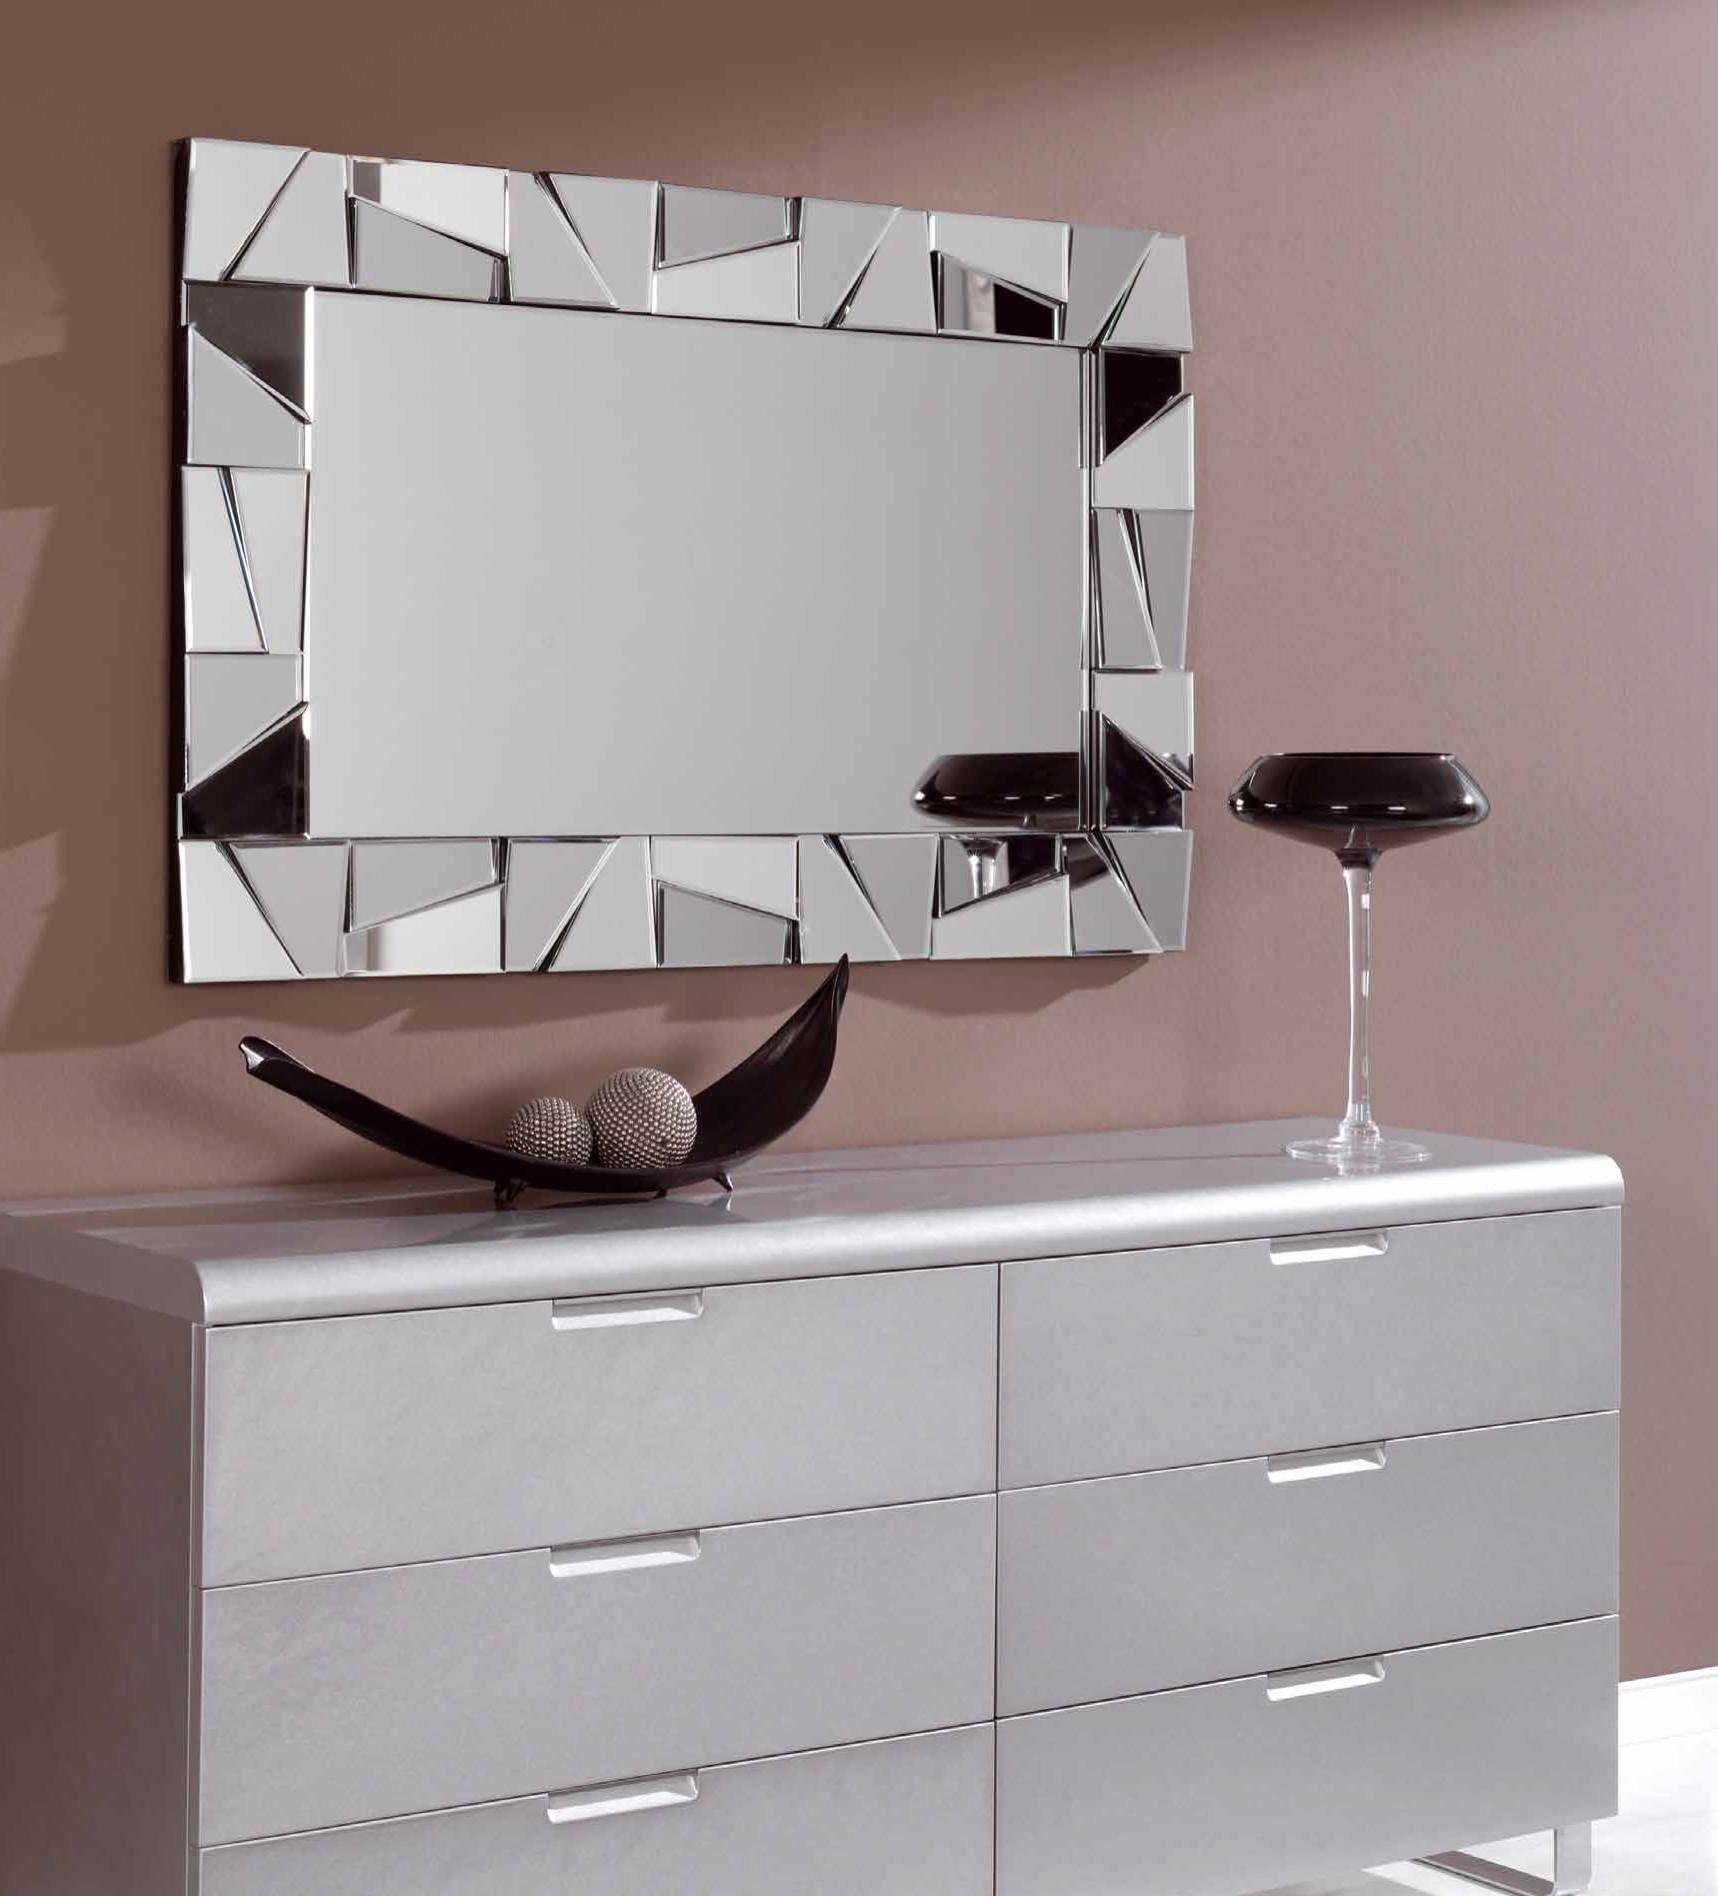 grandes espejos espejos bao espejos modernos espejos decorados decoracin hogar comedores modernos recibidores consultorio vitrinas